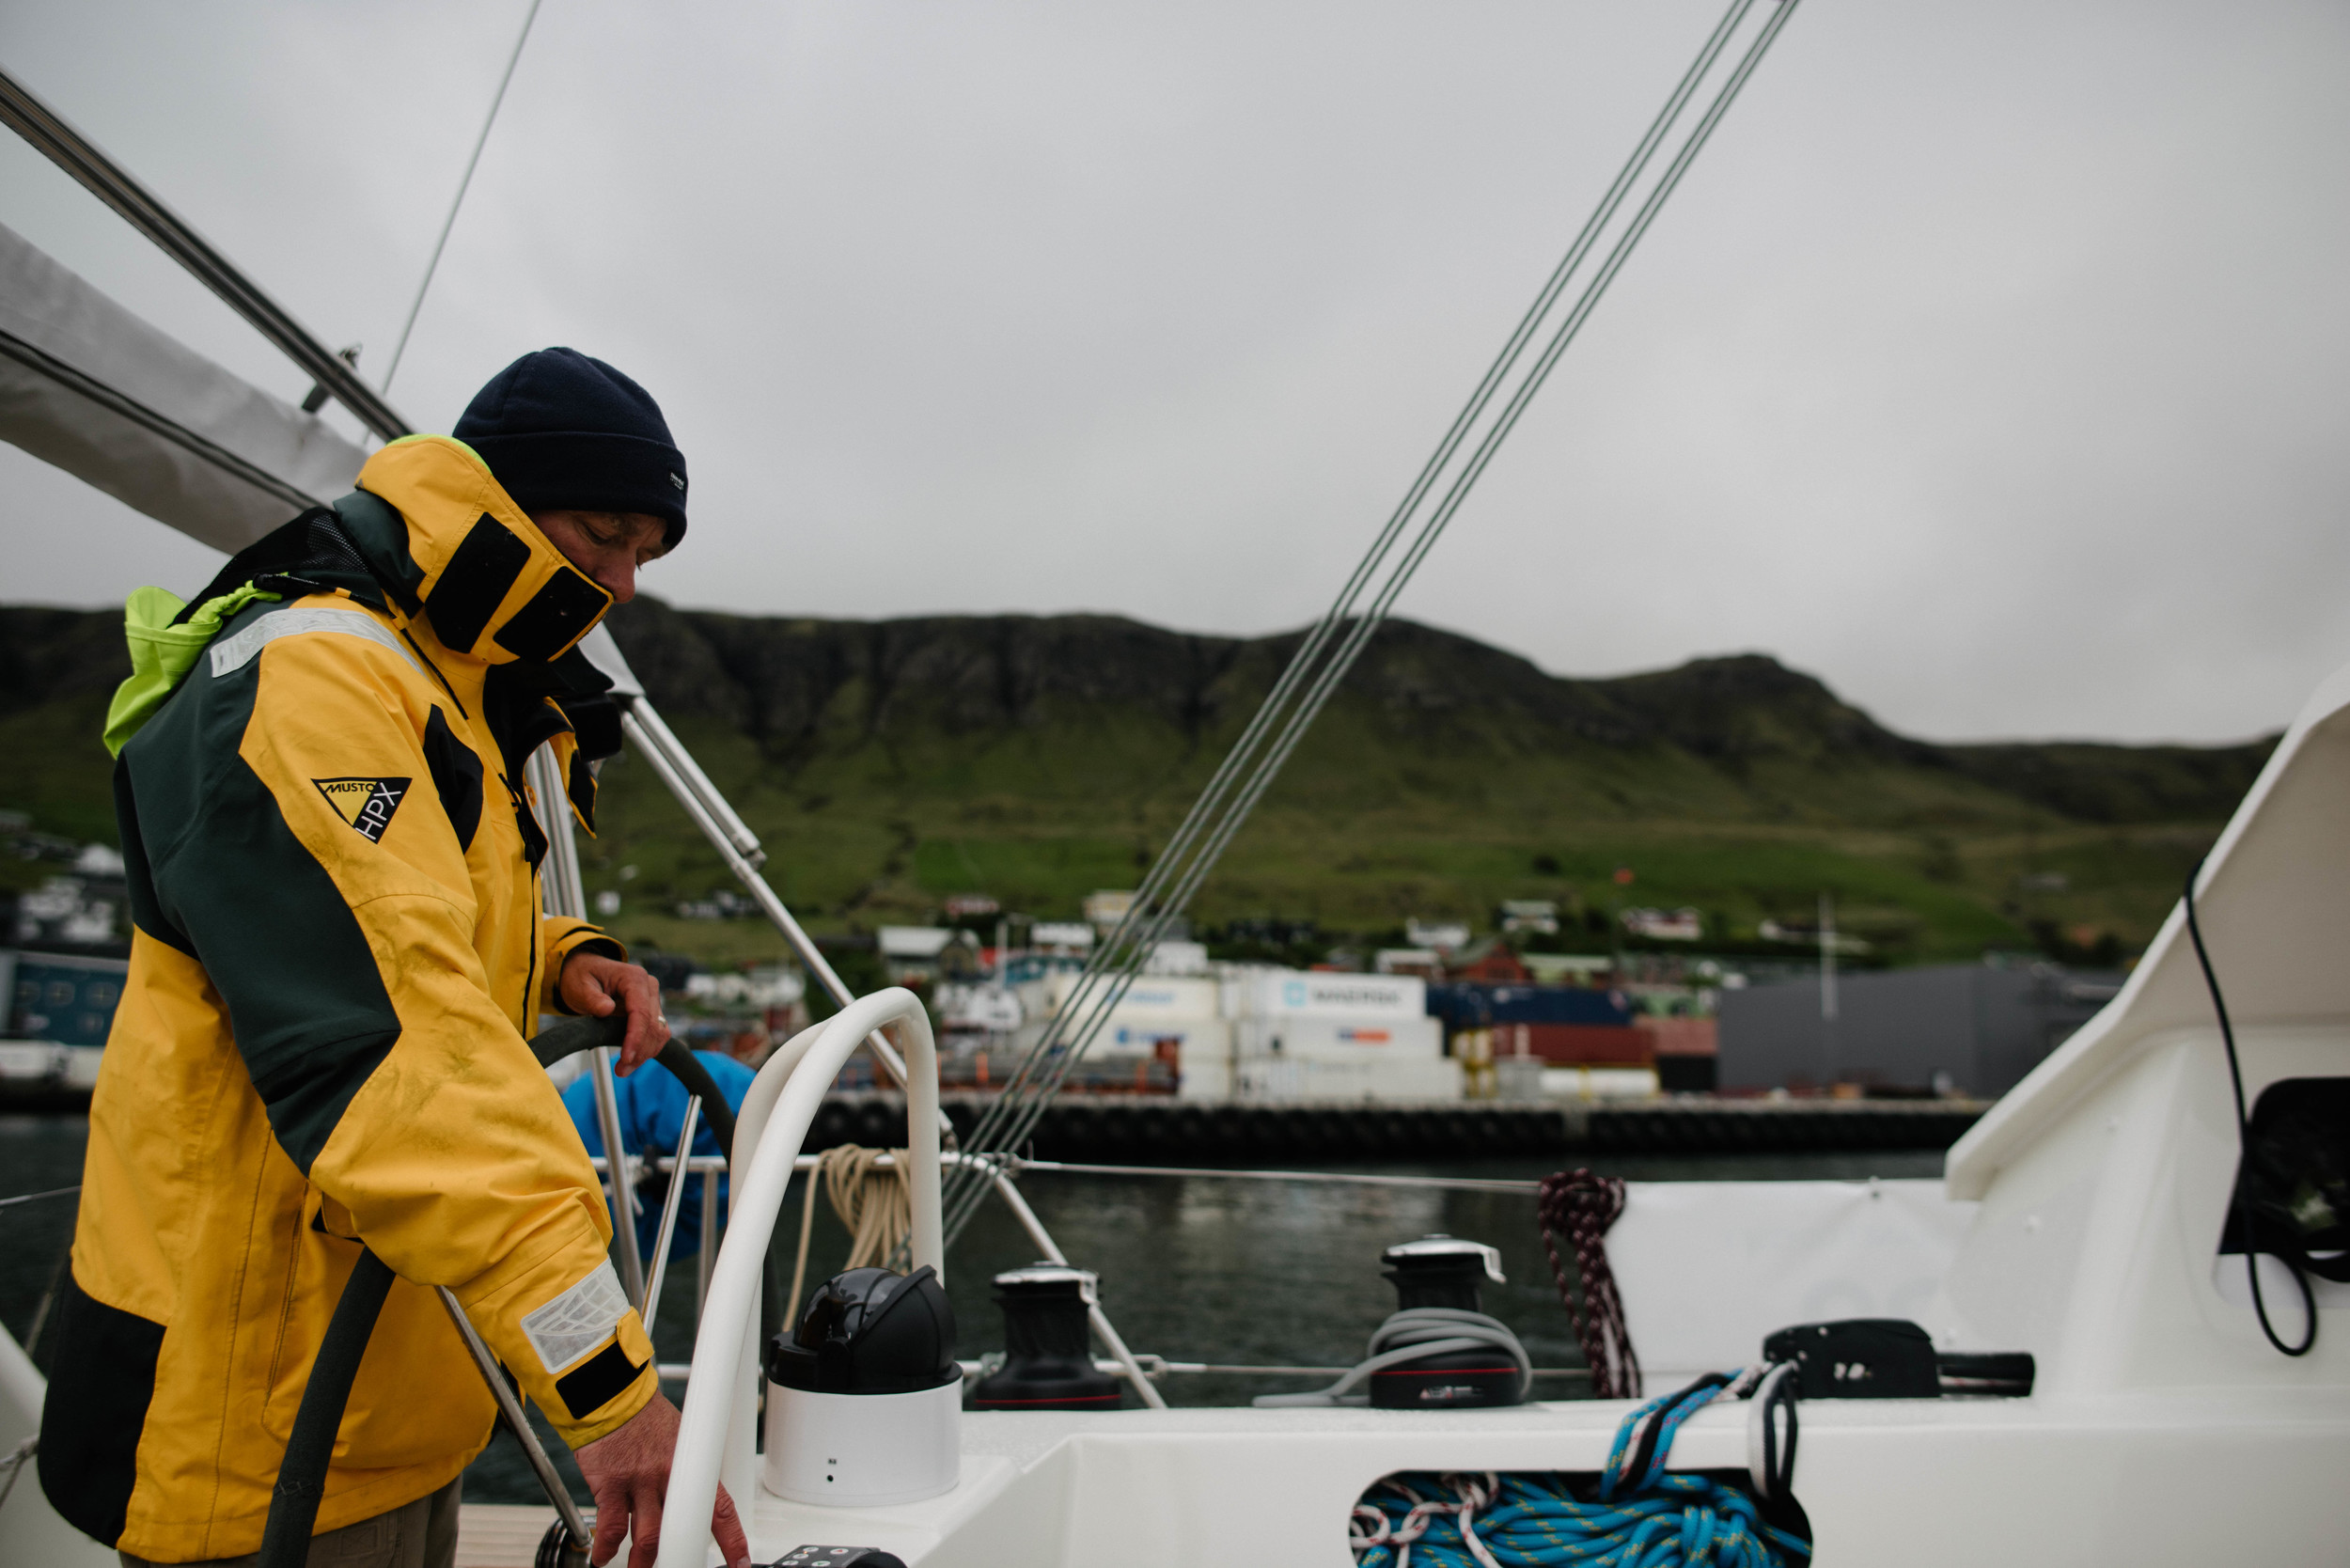 Faroes_Troyoroi-6605.jpg